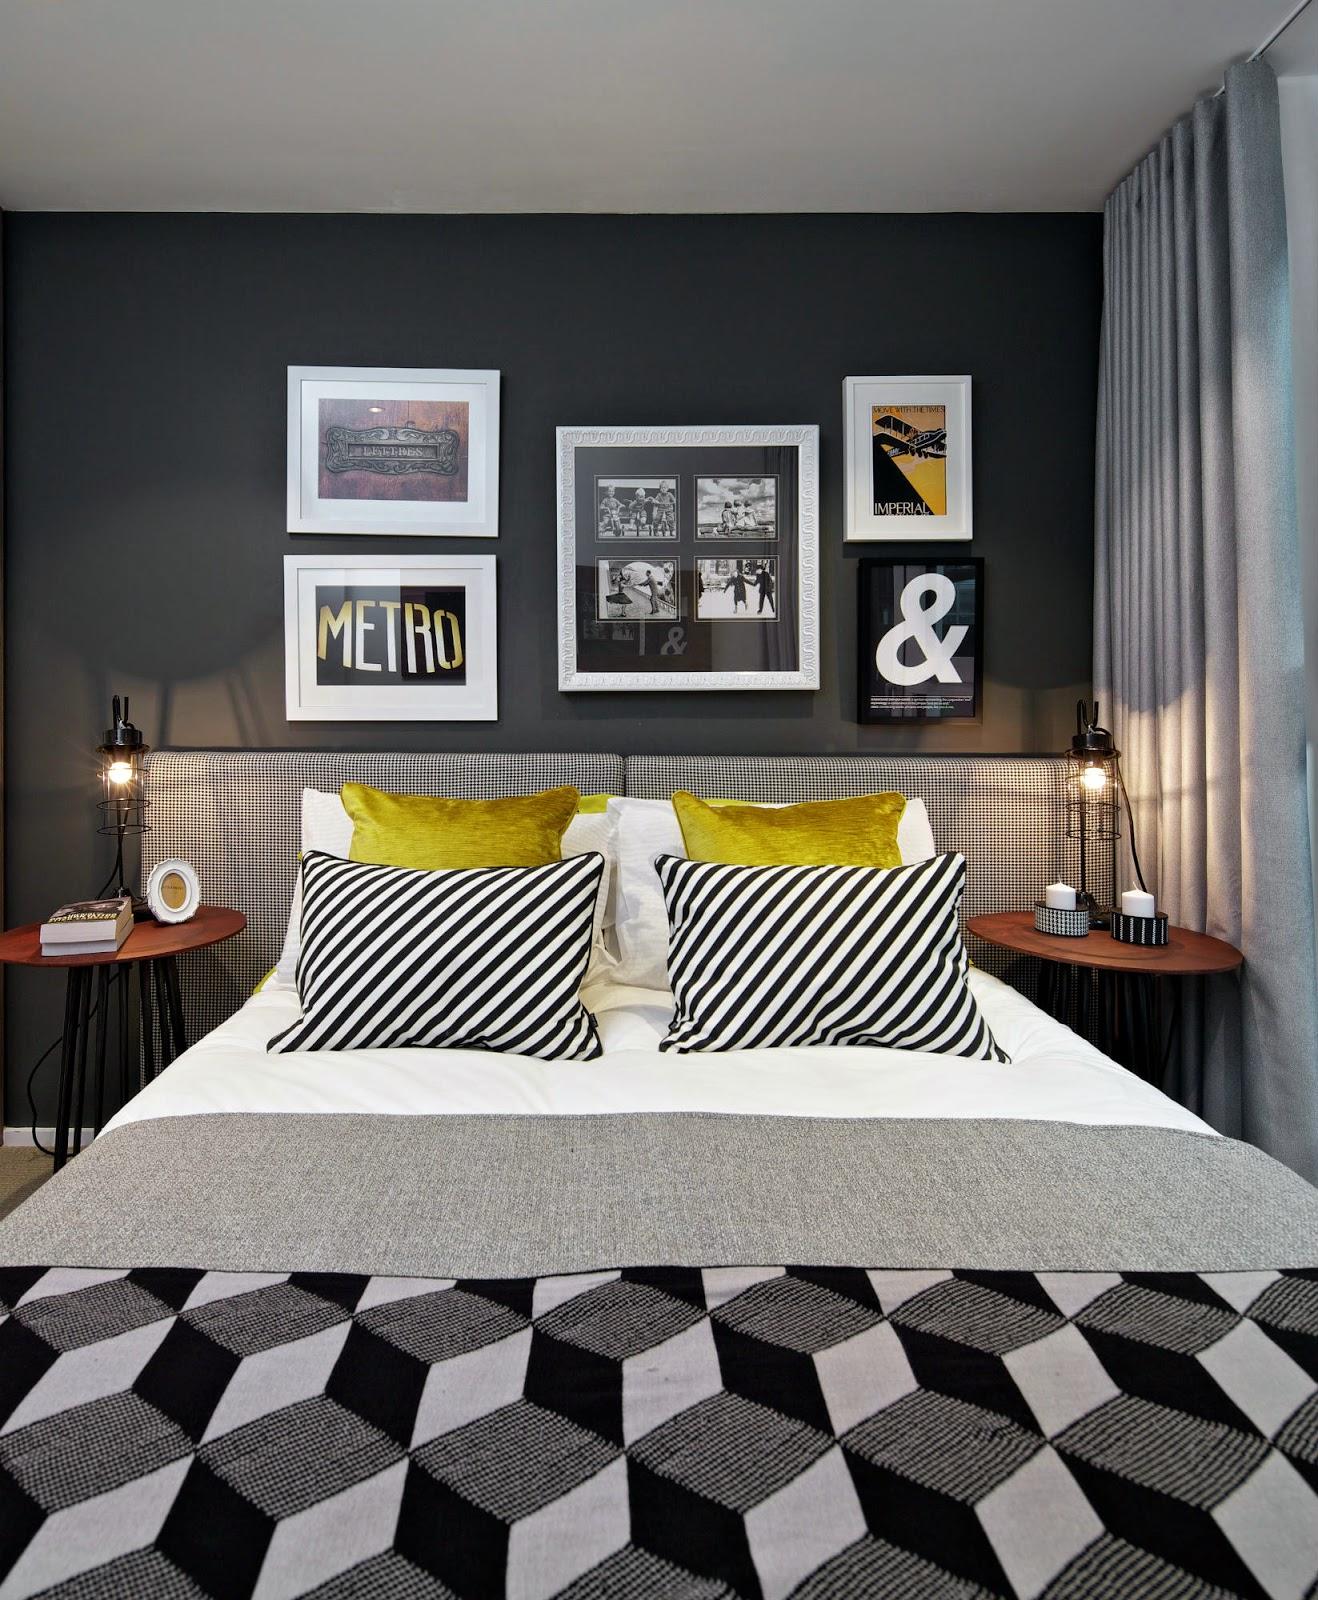 9 Sizzling Bedroom Decor Ideas